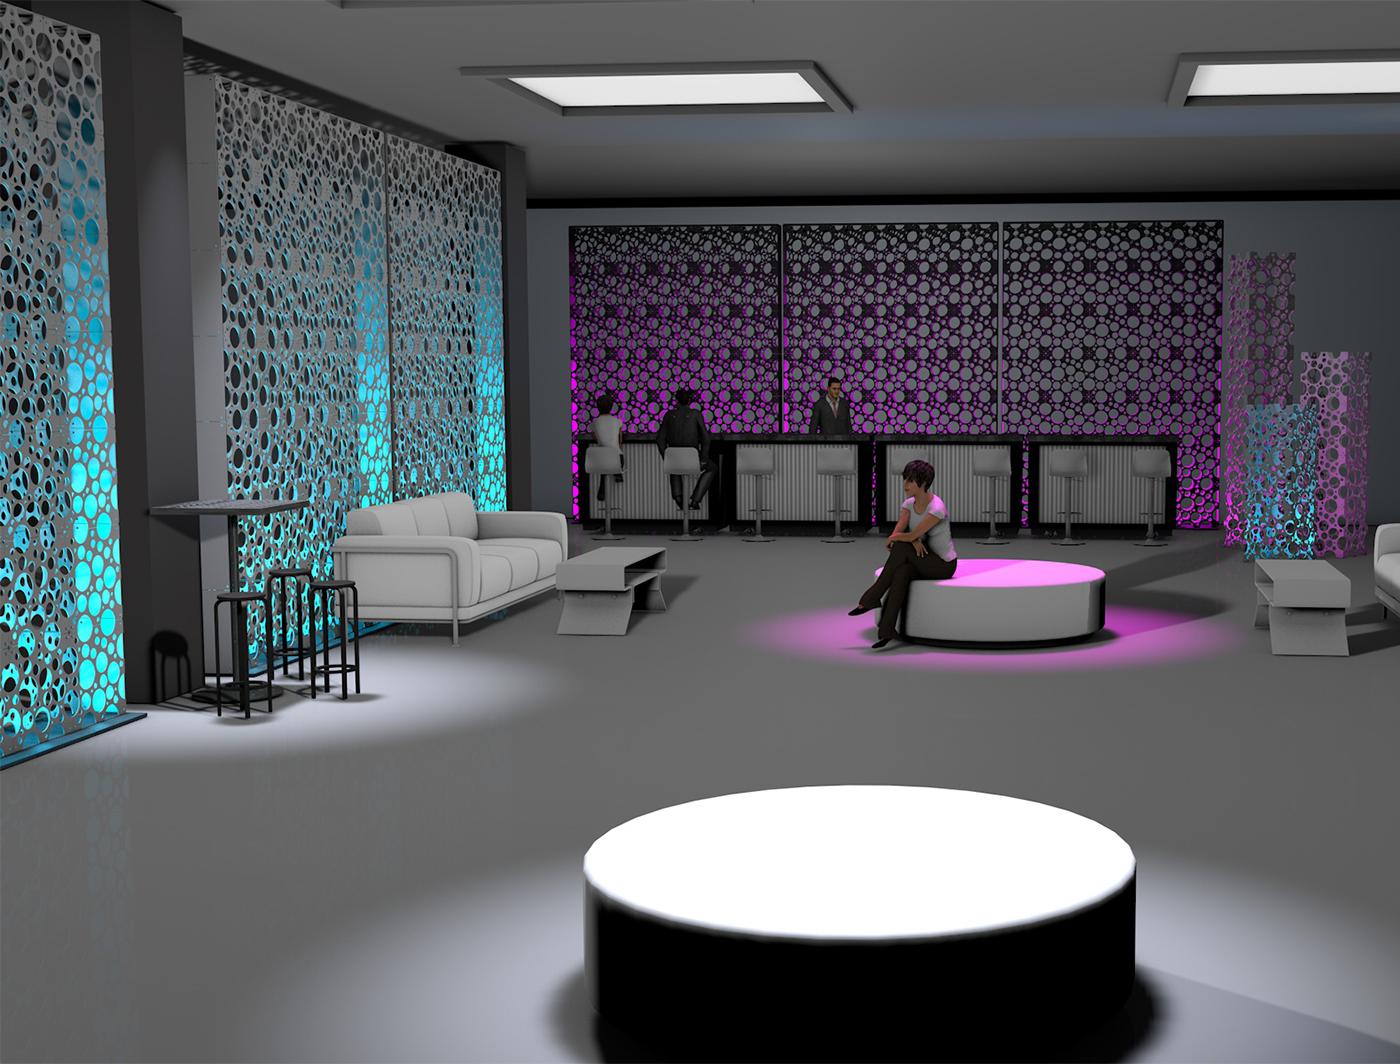 Fizz panels create a vibrant lounge space